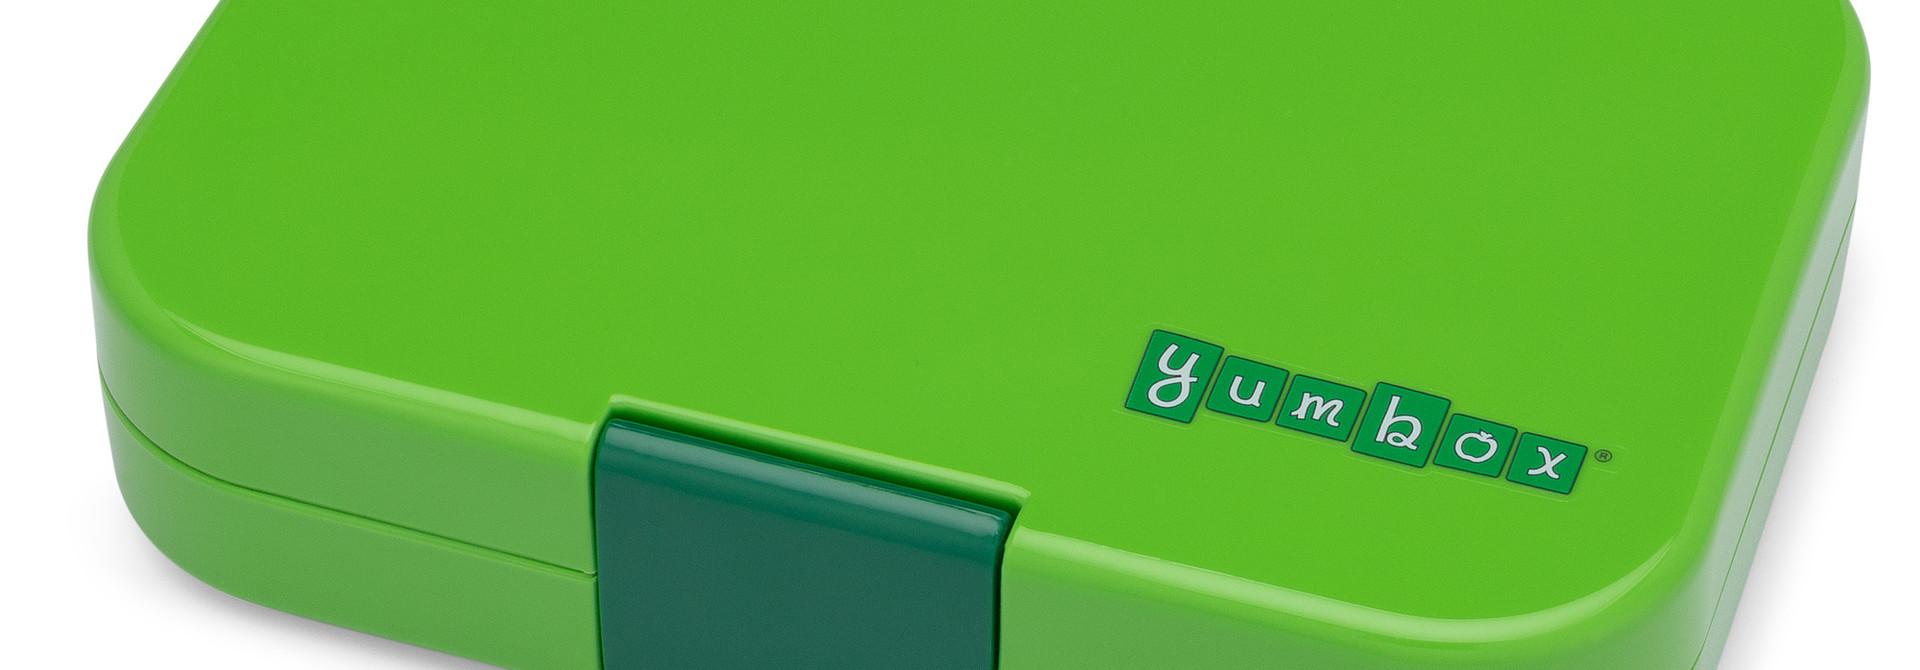 Yumbox Original exterior box Go Green